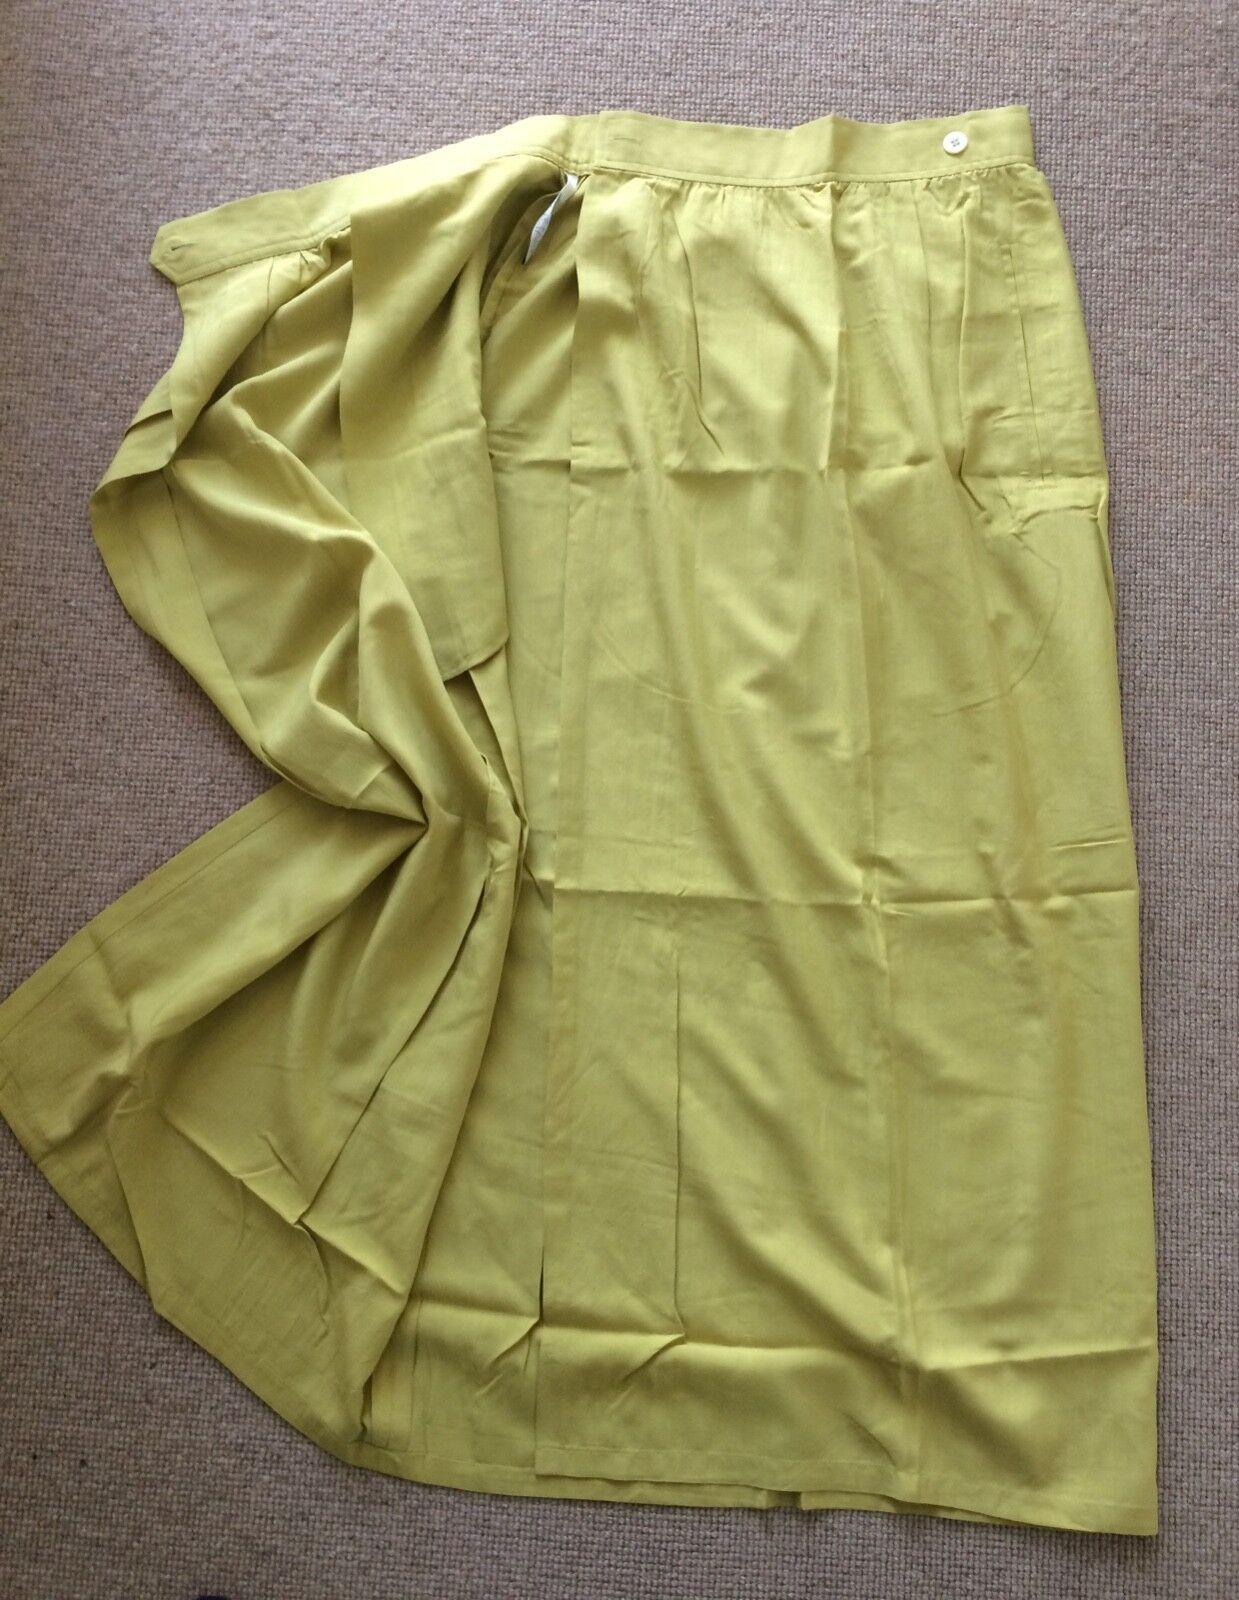 Nicole Farhi Silk Wrap Skirt (Vintage) Size 8 10